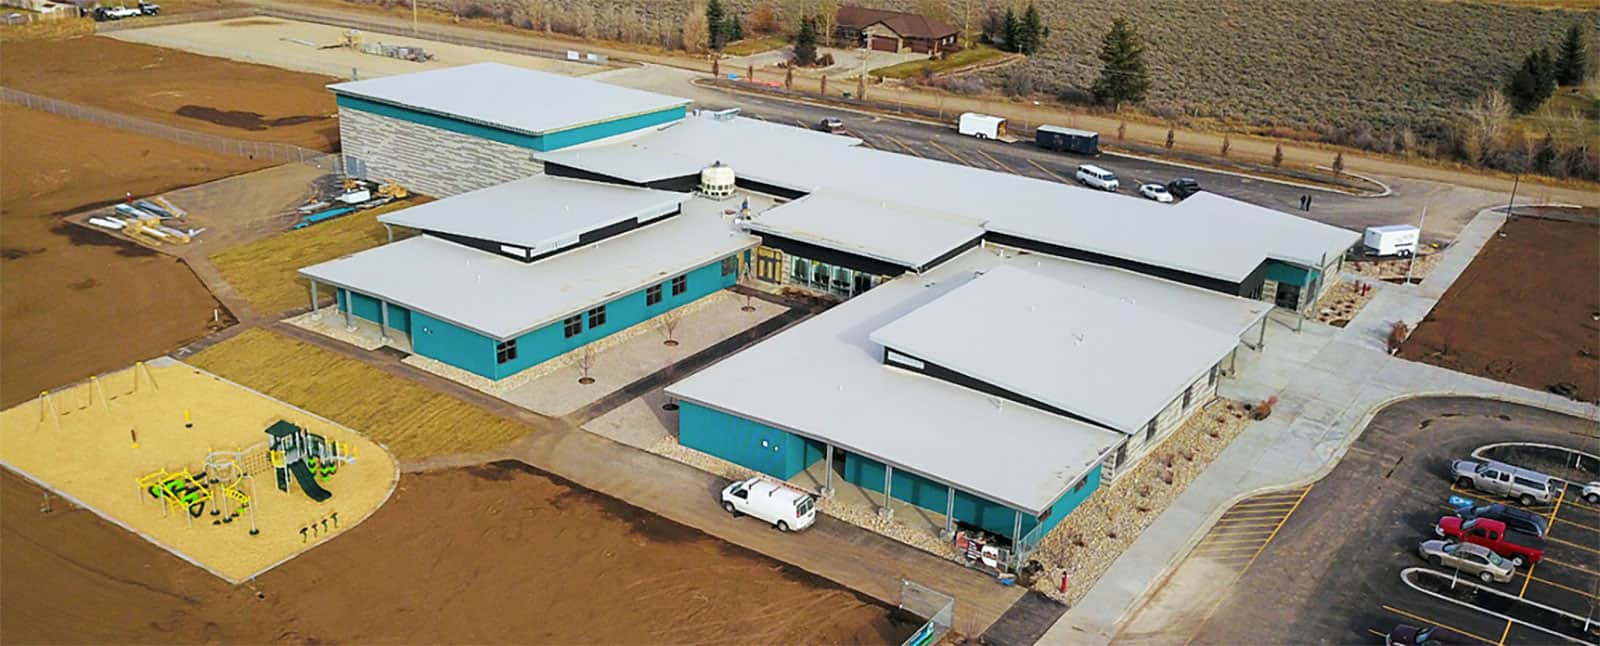 Victor Elementary School